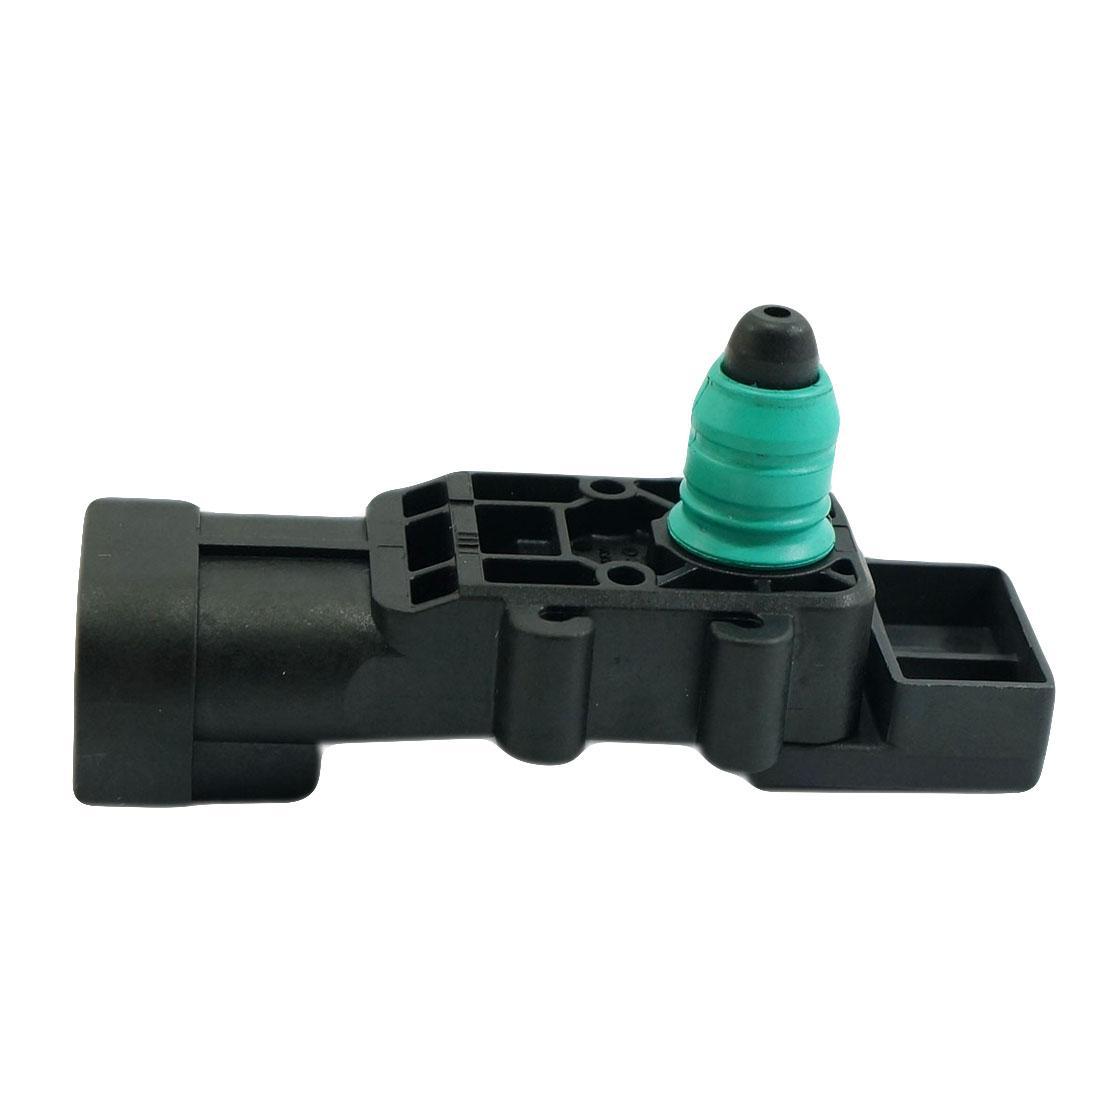 0261230244 Interruptor del sensor de presión del tanque de la bomba de combustible 9U5A-9C052-CD